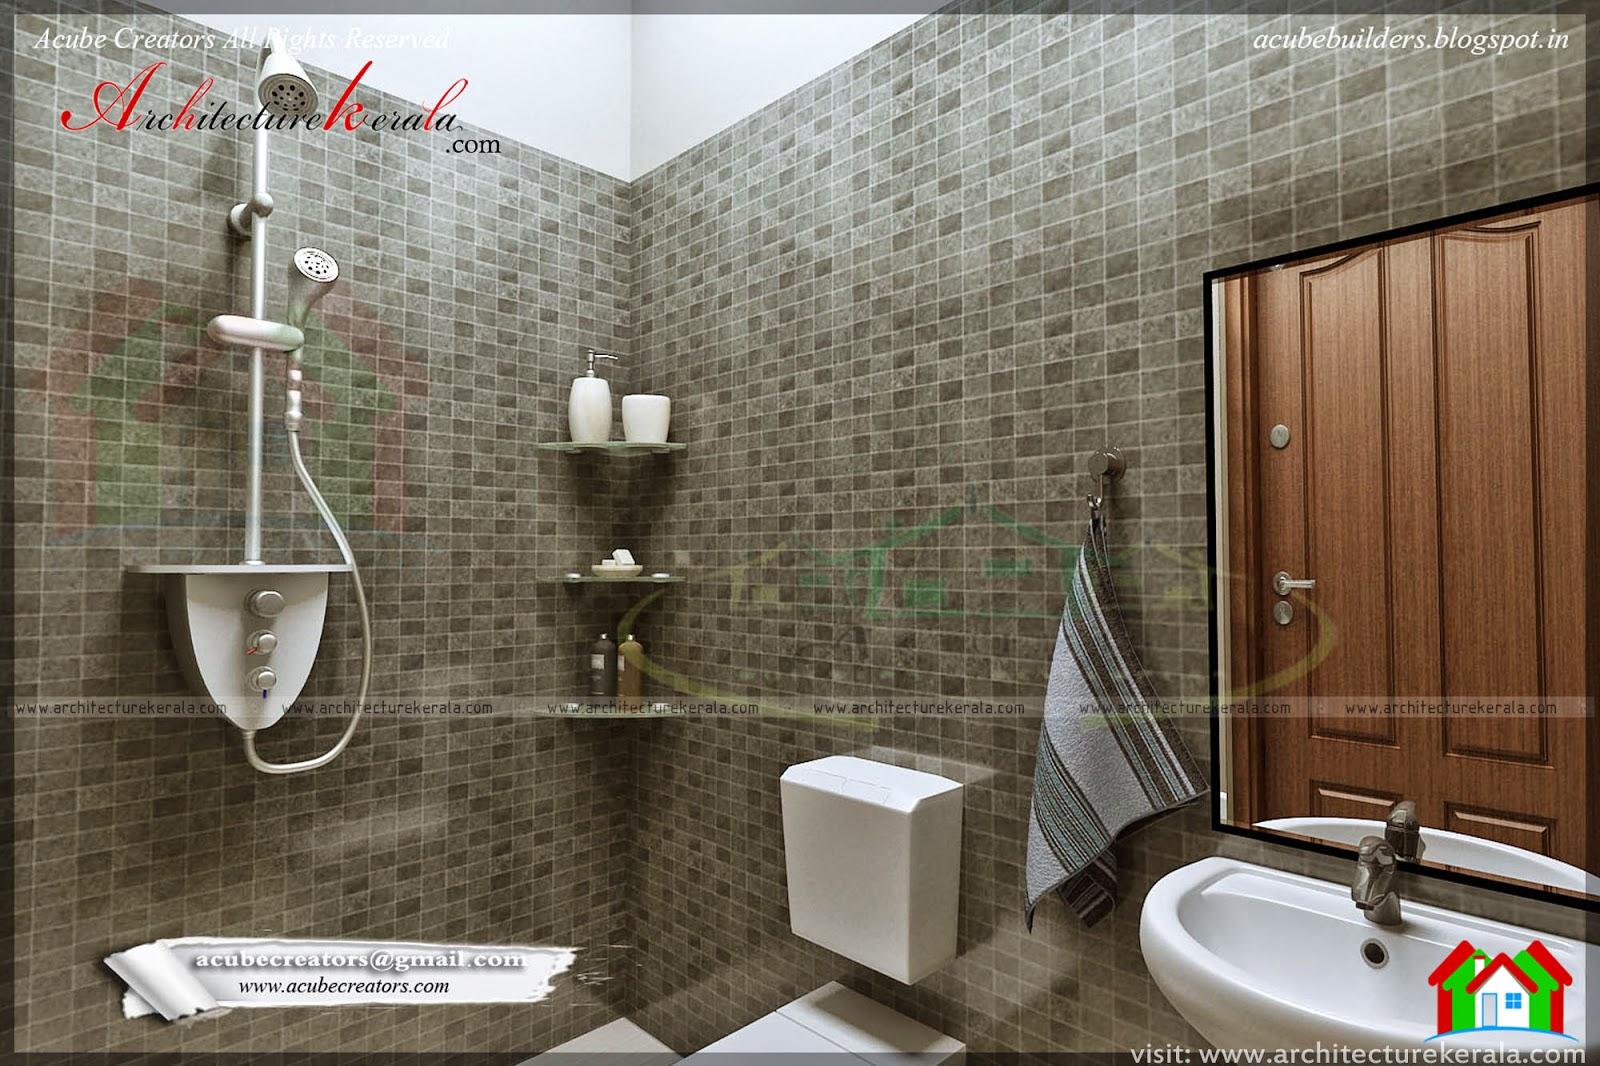 BATHROOM INTERIOR DESIGN - ARCHITECTURE KERALA